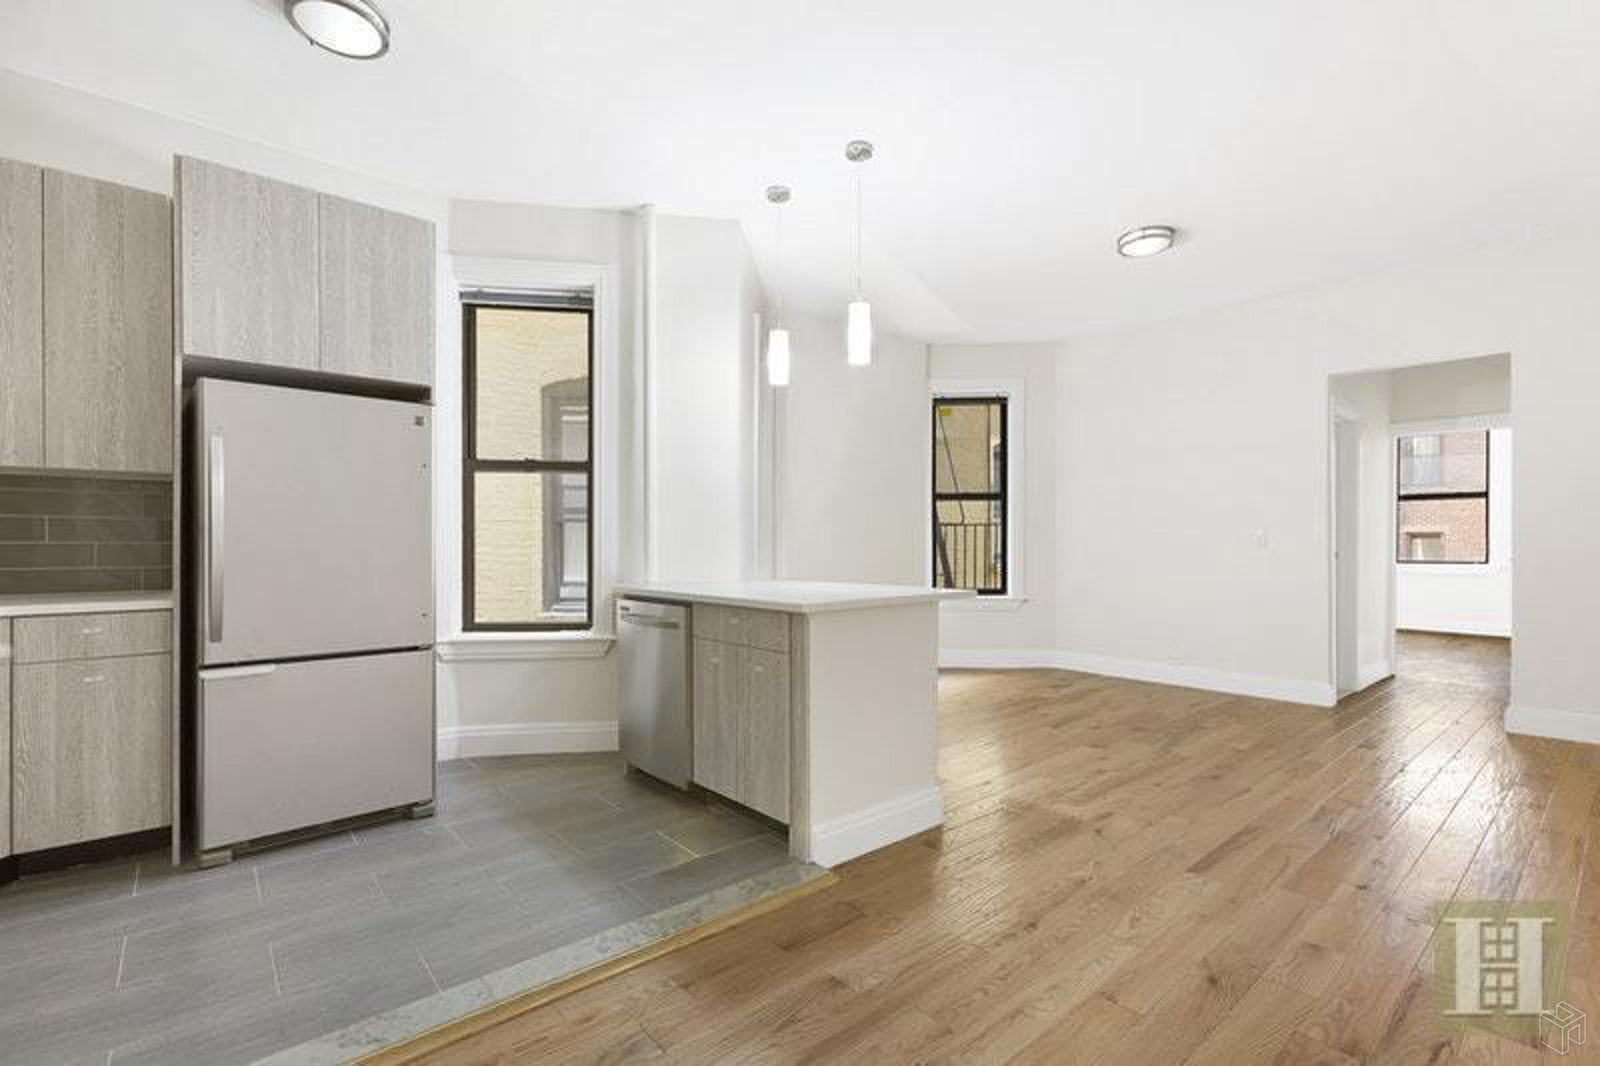 17 WEST 125TH STREET 3L, Harlem, $2,499, Web #: 19371398